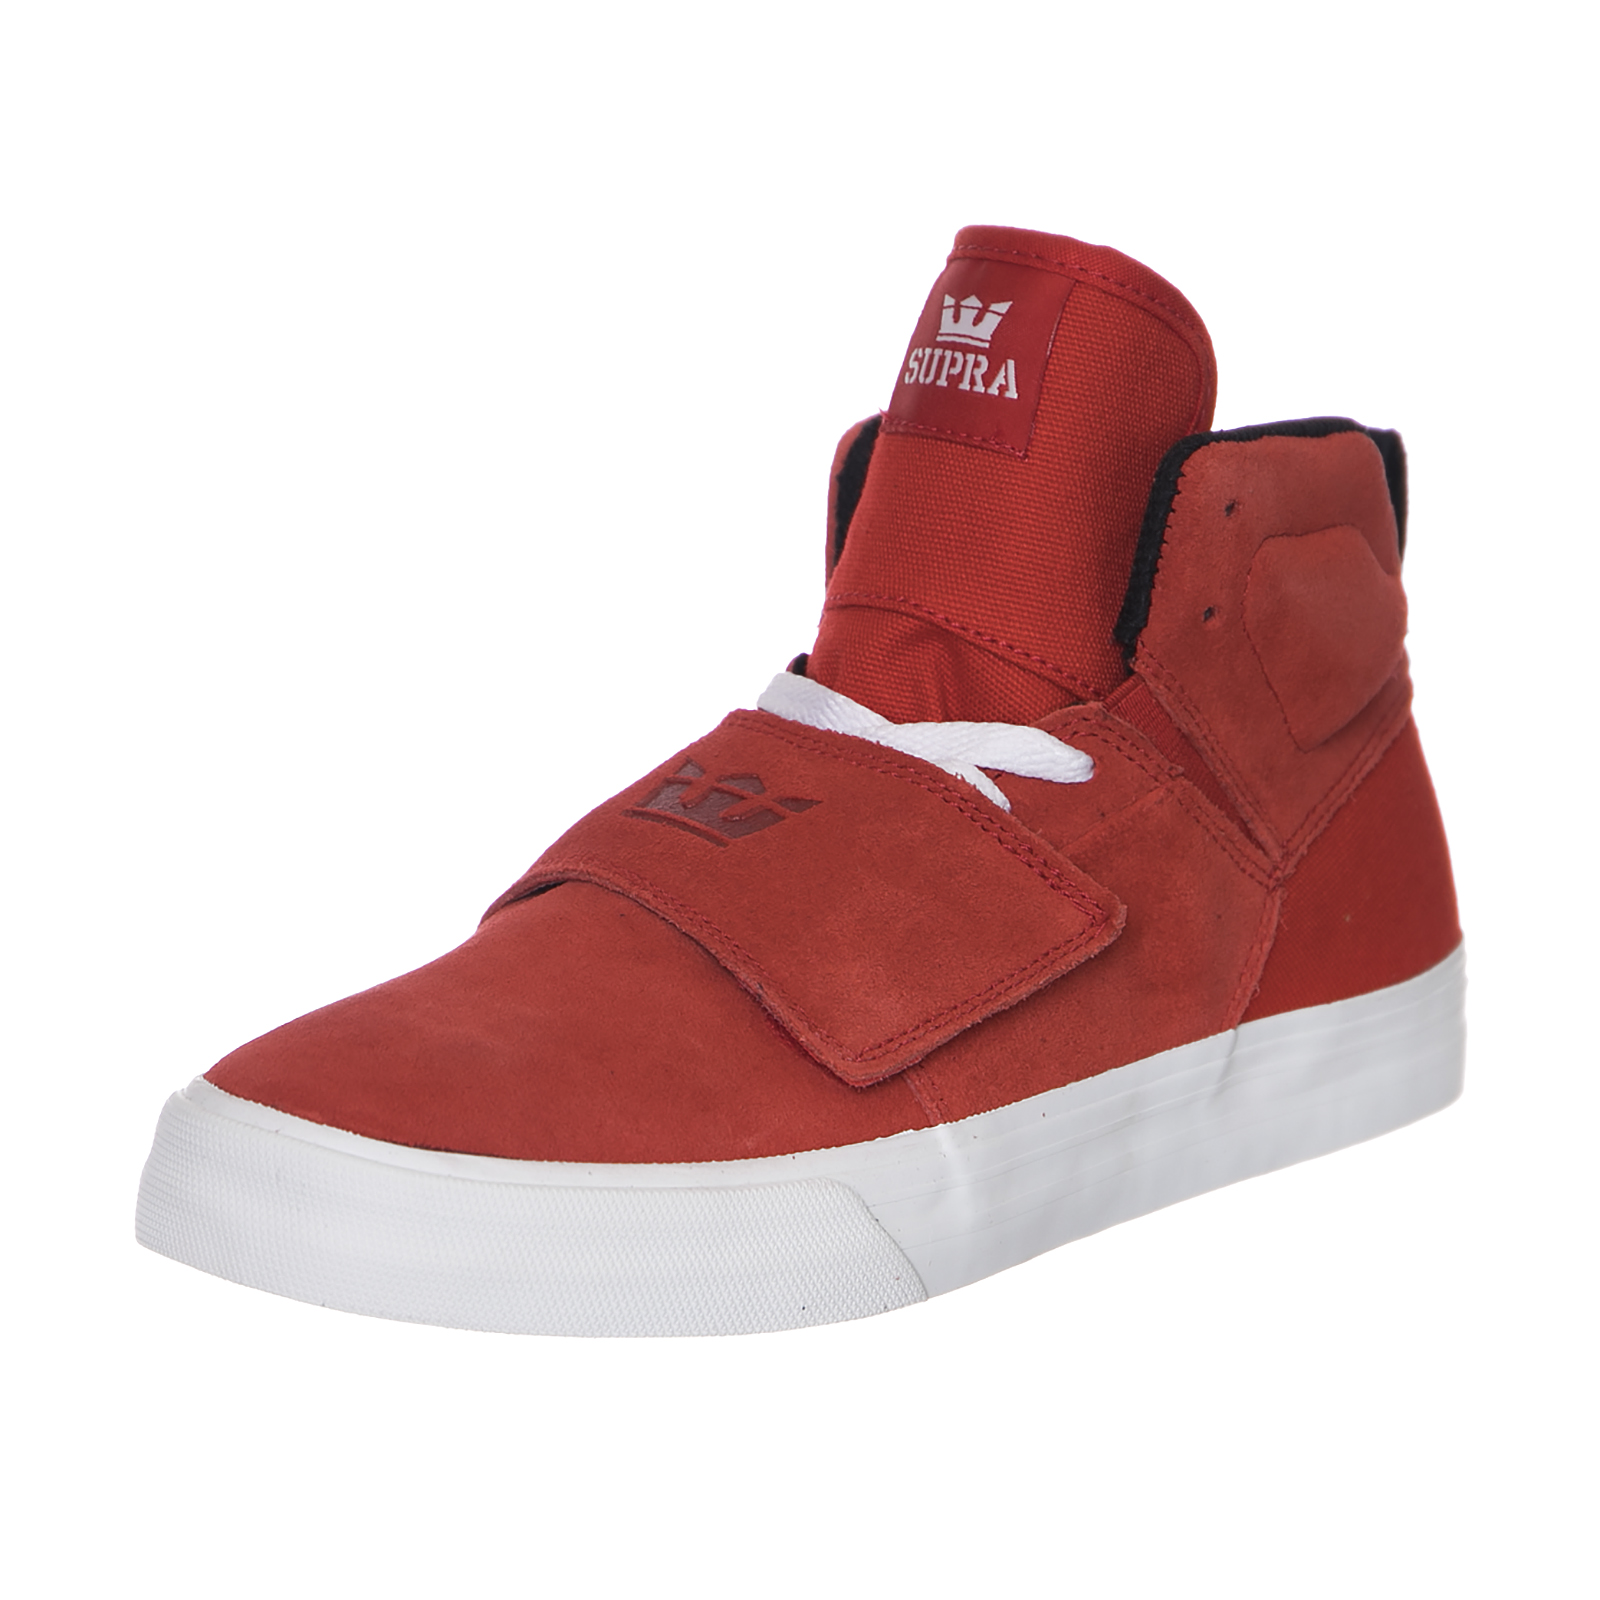 Super scarpe da ginnastica rosso sasso rosso / bianco rosso ginnastica marina angolare d3ee6e